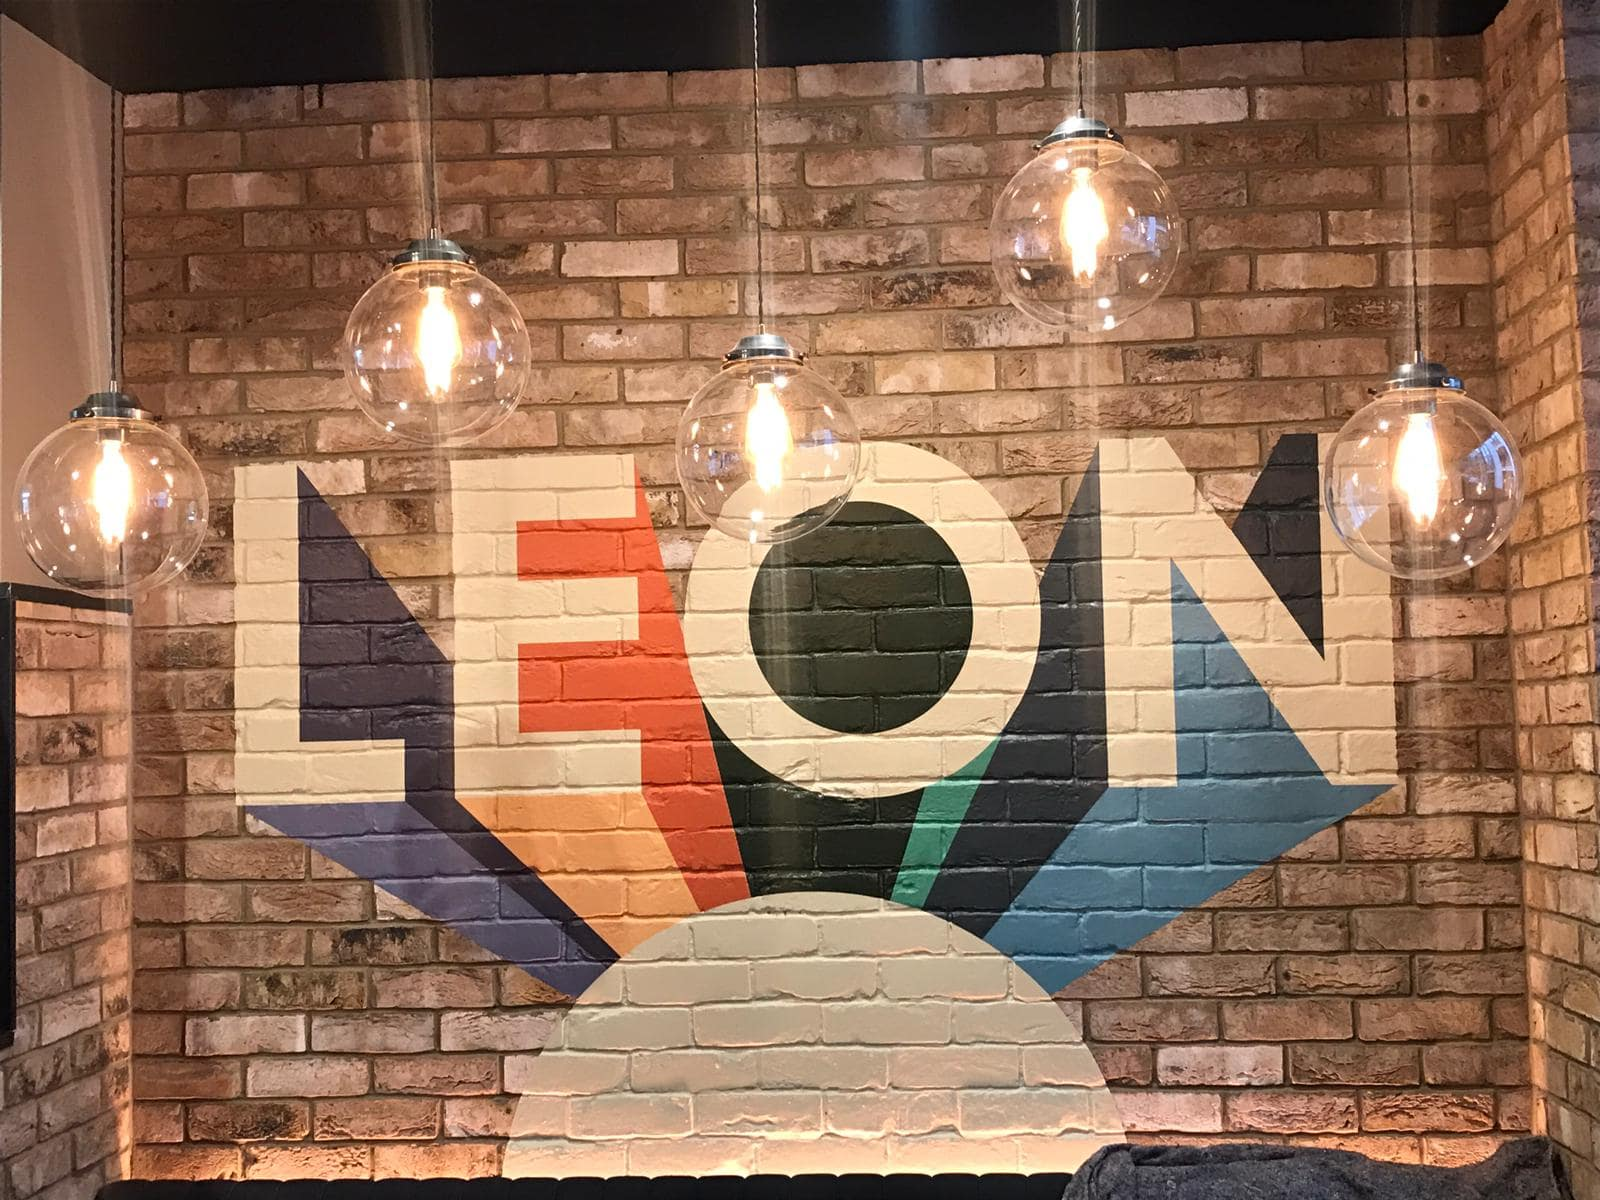 Leon, Notting Hill, London